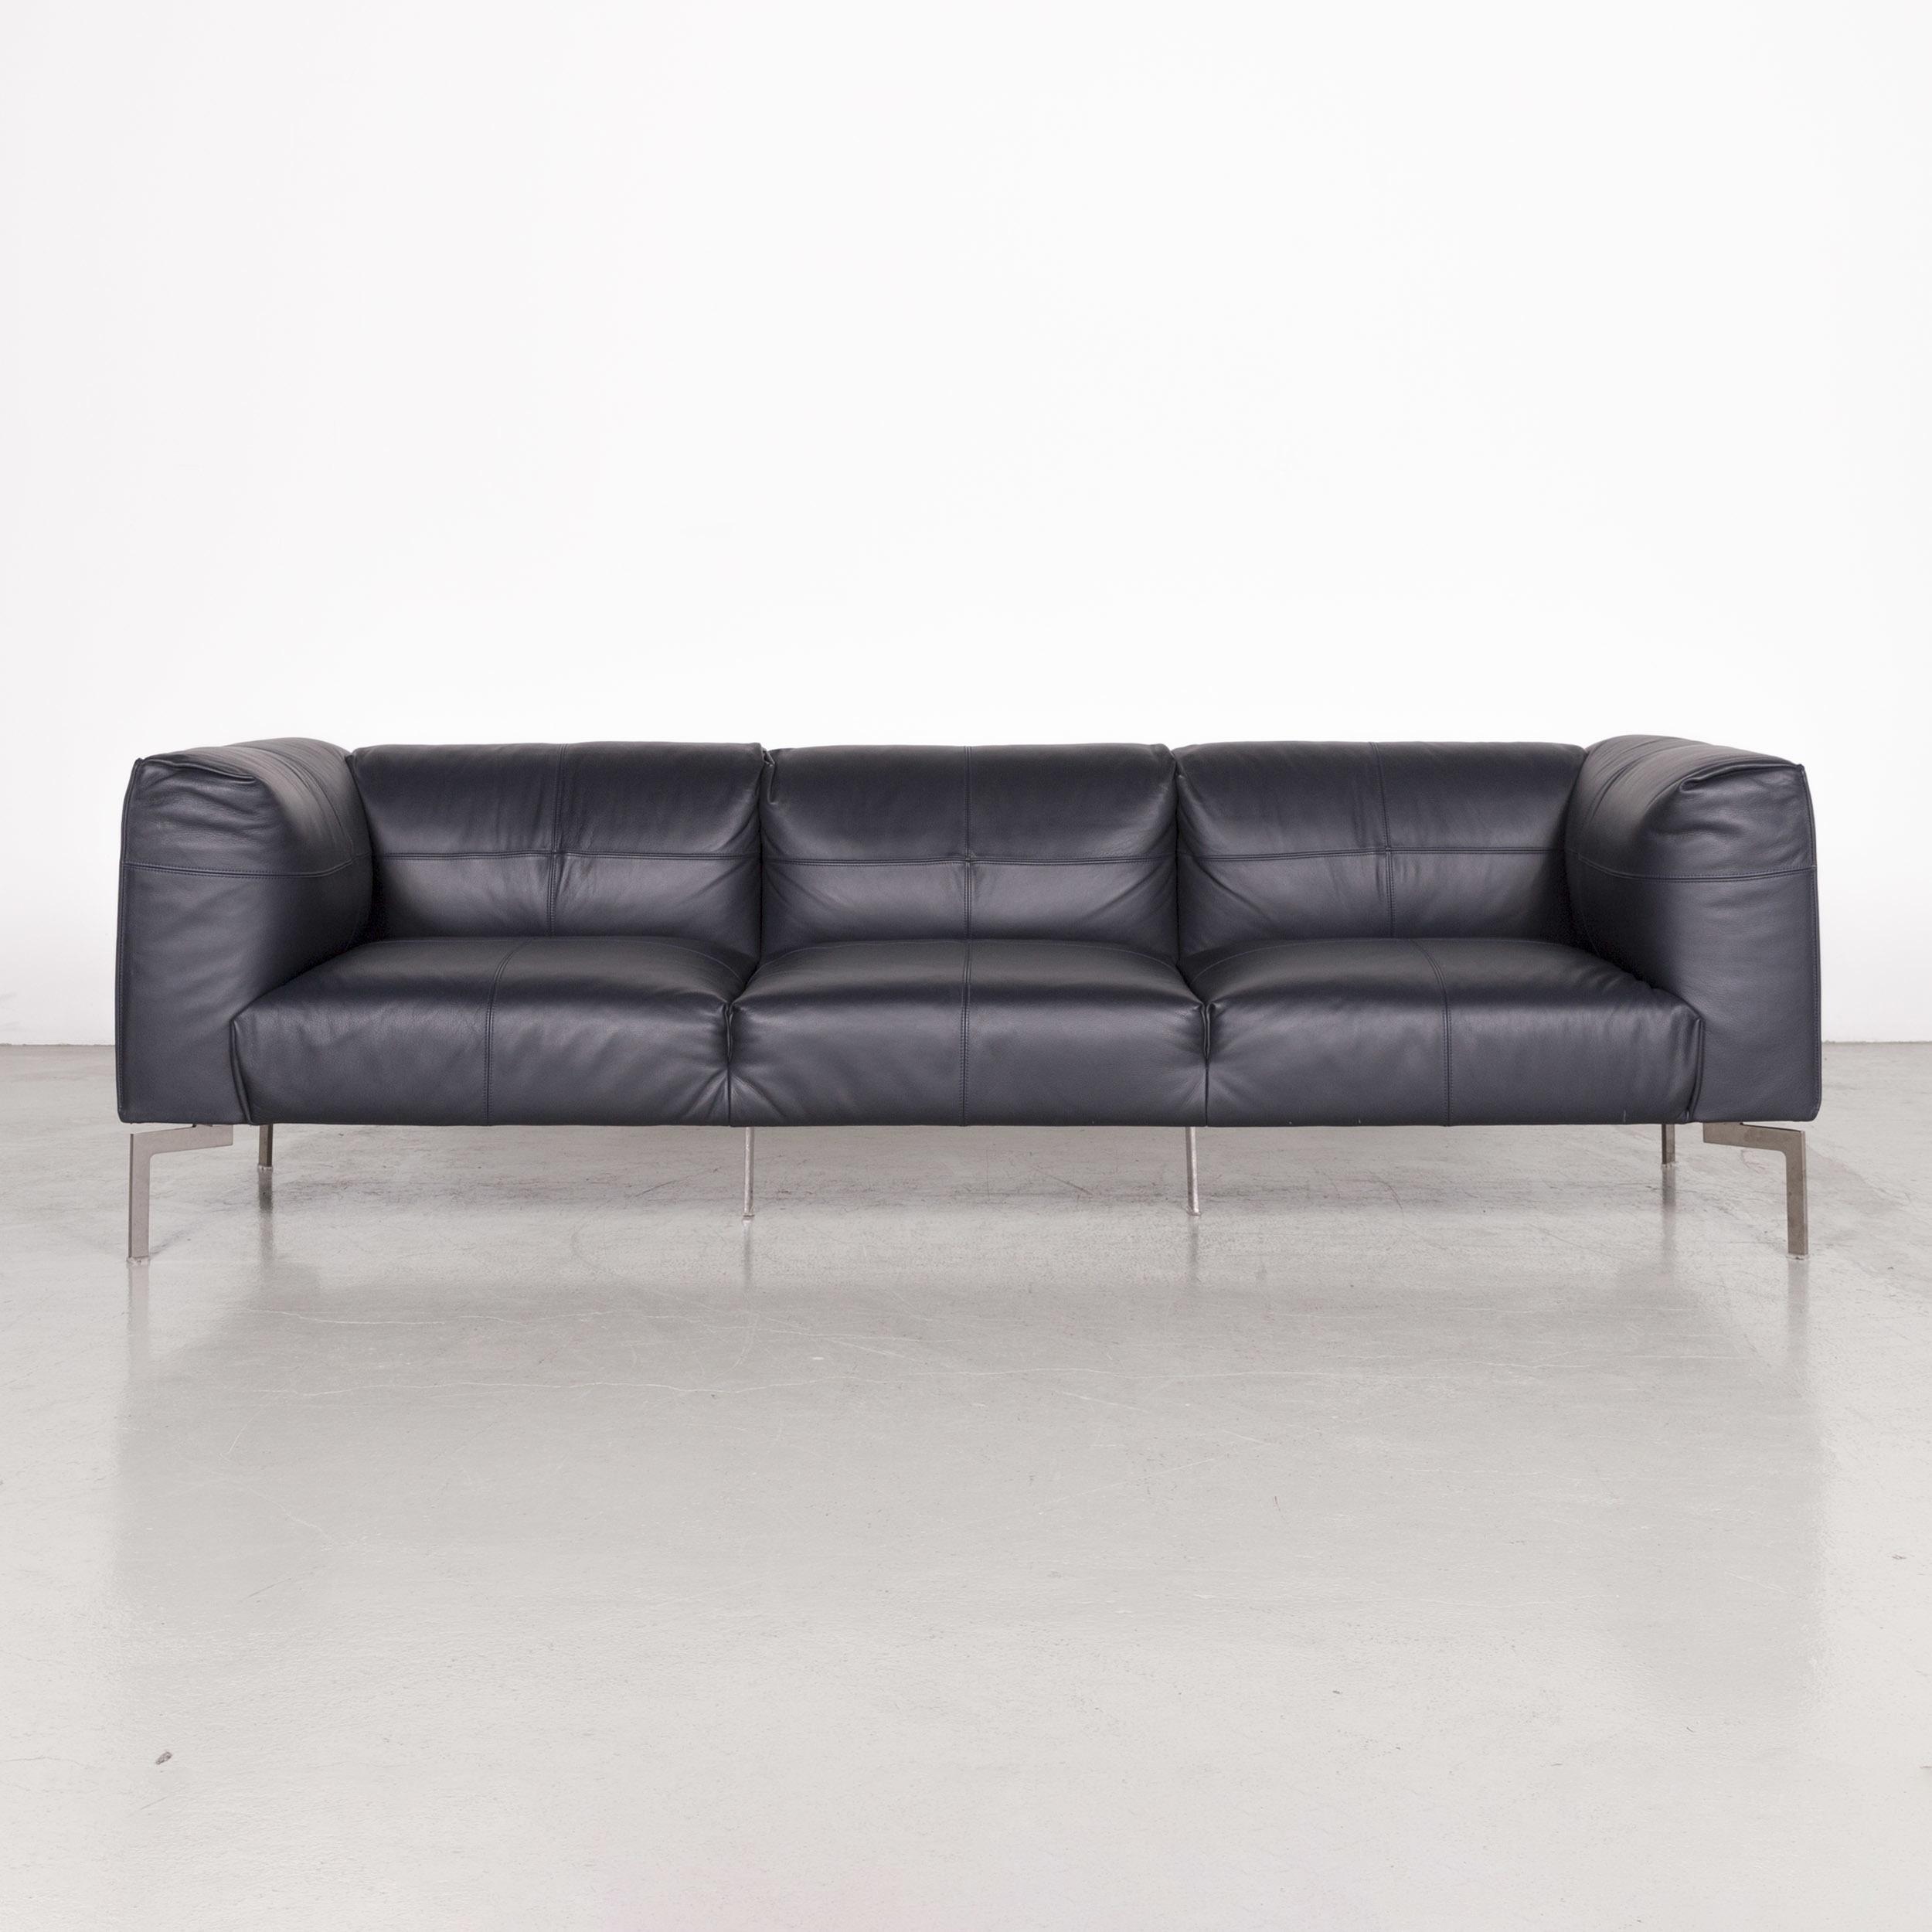 Poltrona Frau Bosforo.Poltrona Frau Bosforo Designer Leather Sofa Blue Genuine Leather By Sezgin Aksu And Silvia Suardi Genuine Leather Three Seater Couch